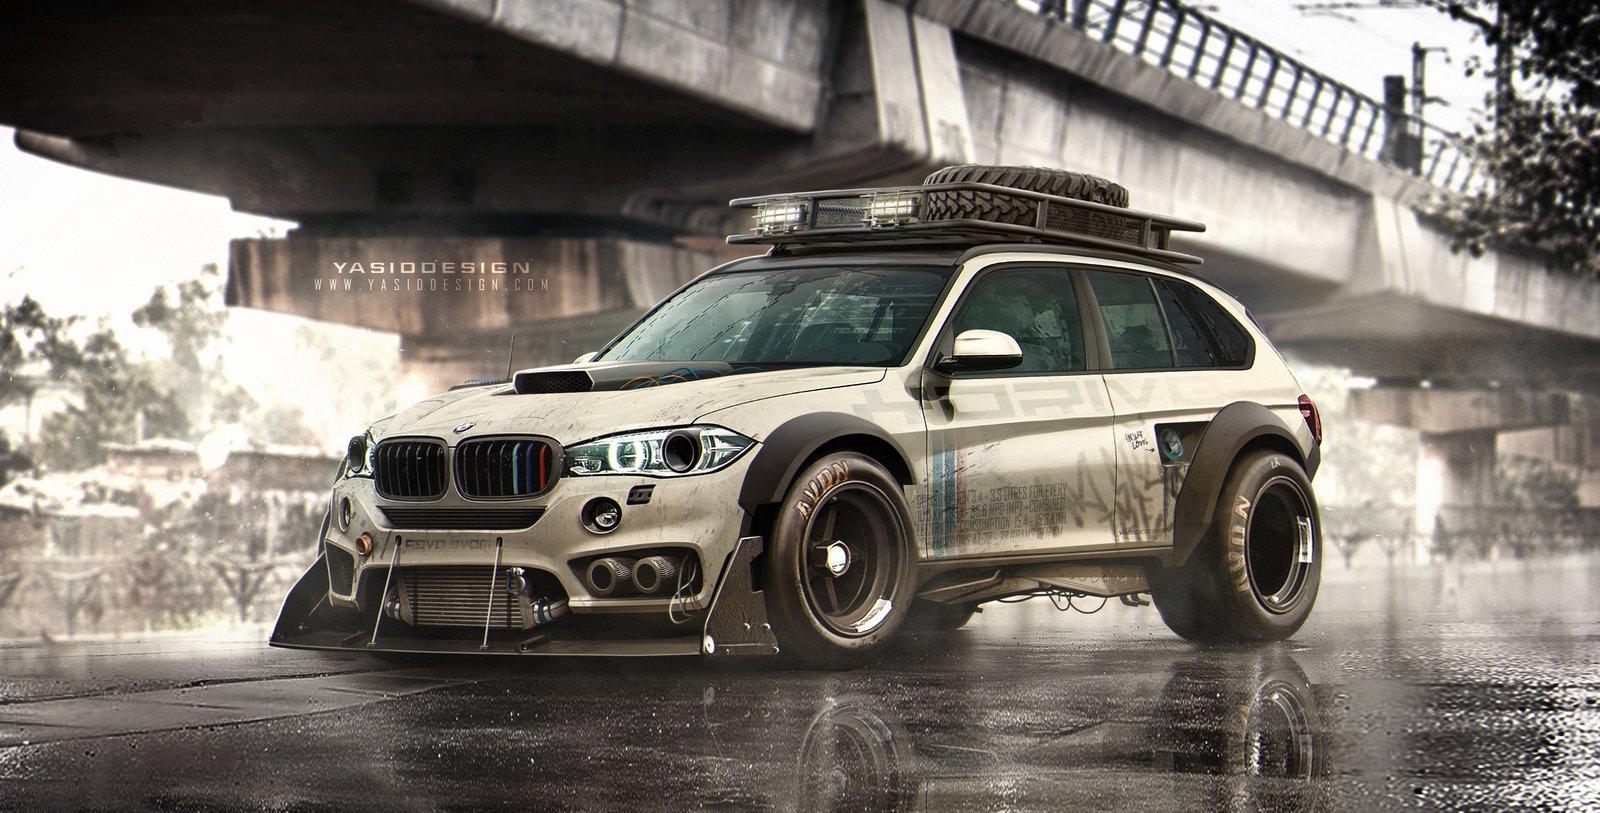 BMW X5 Drive _ Post apocalyptic urban